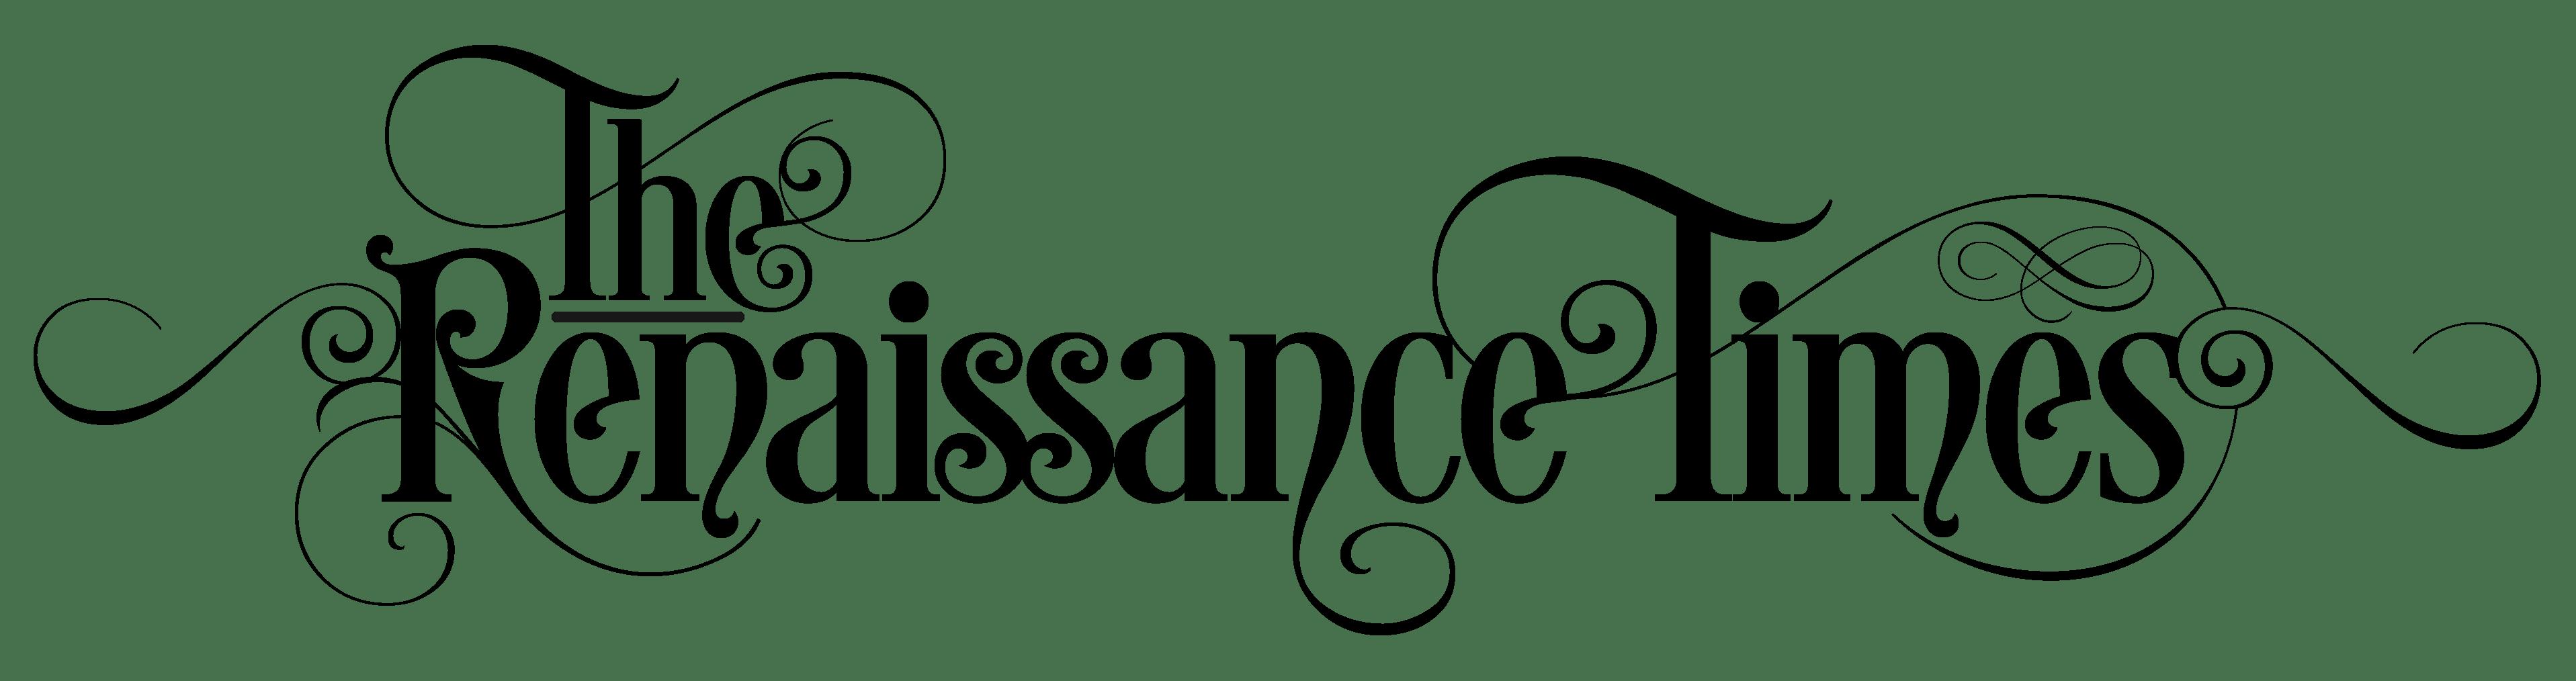 Home - The Renaissance Times